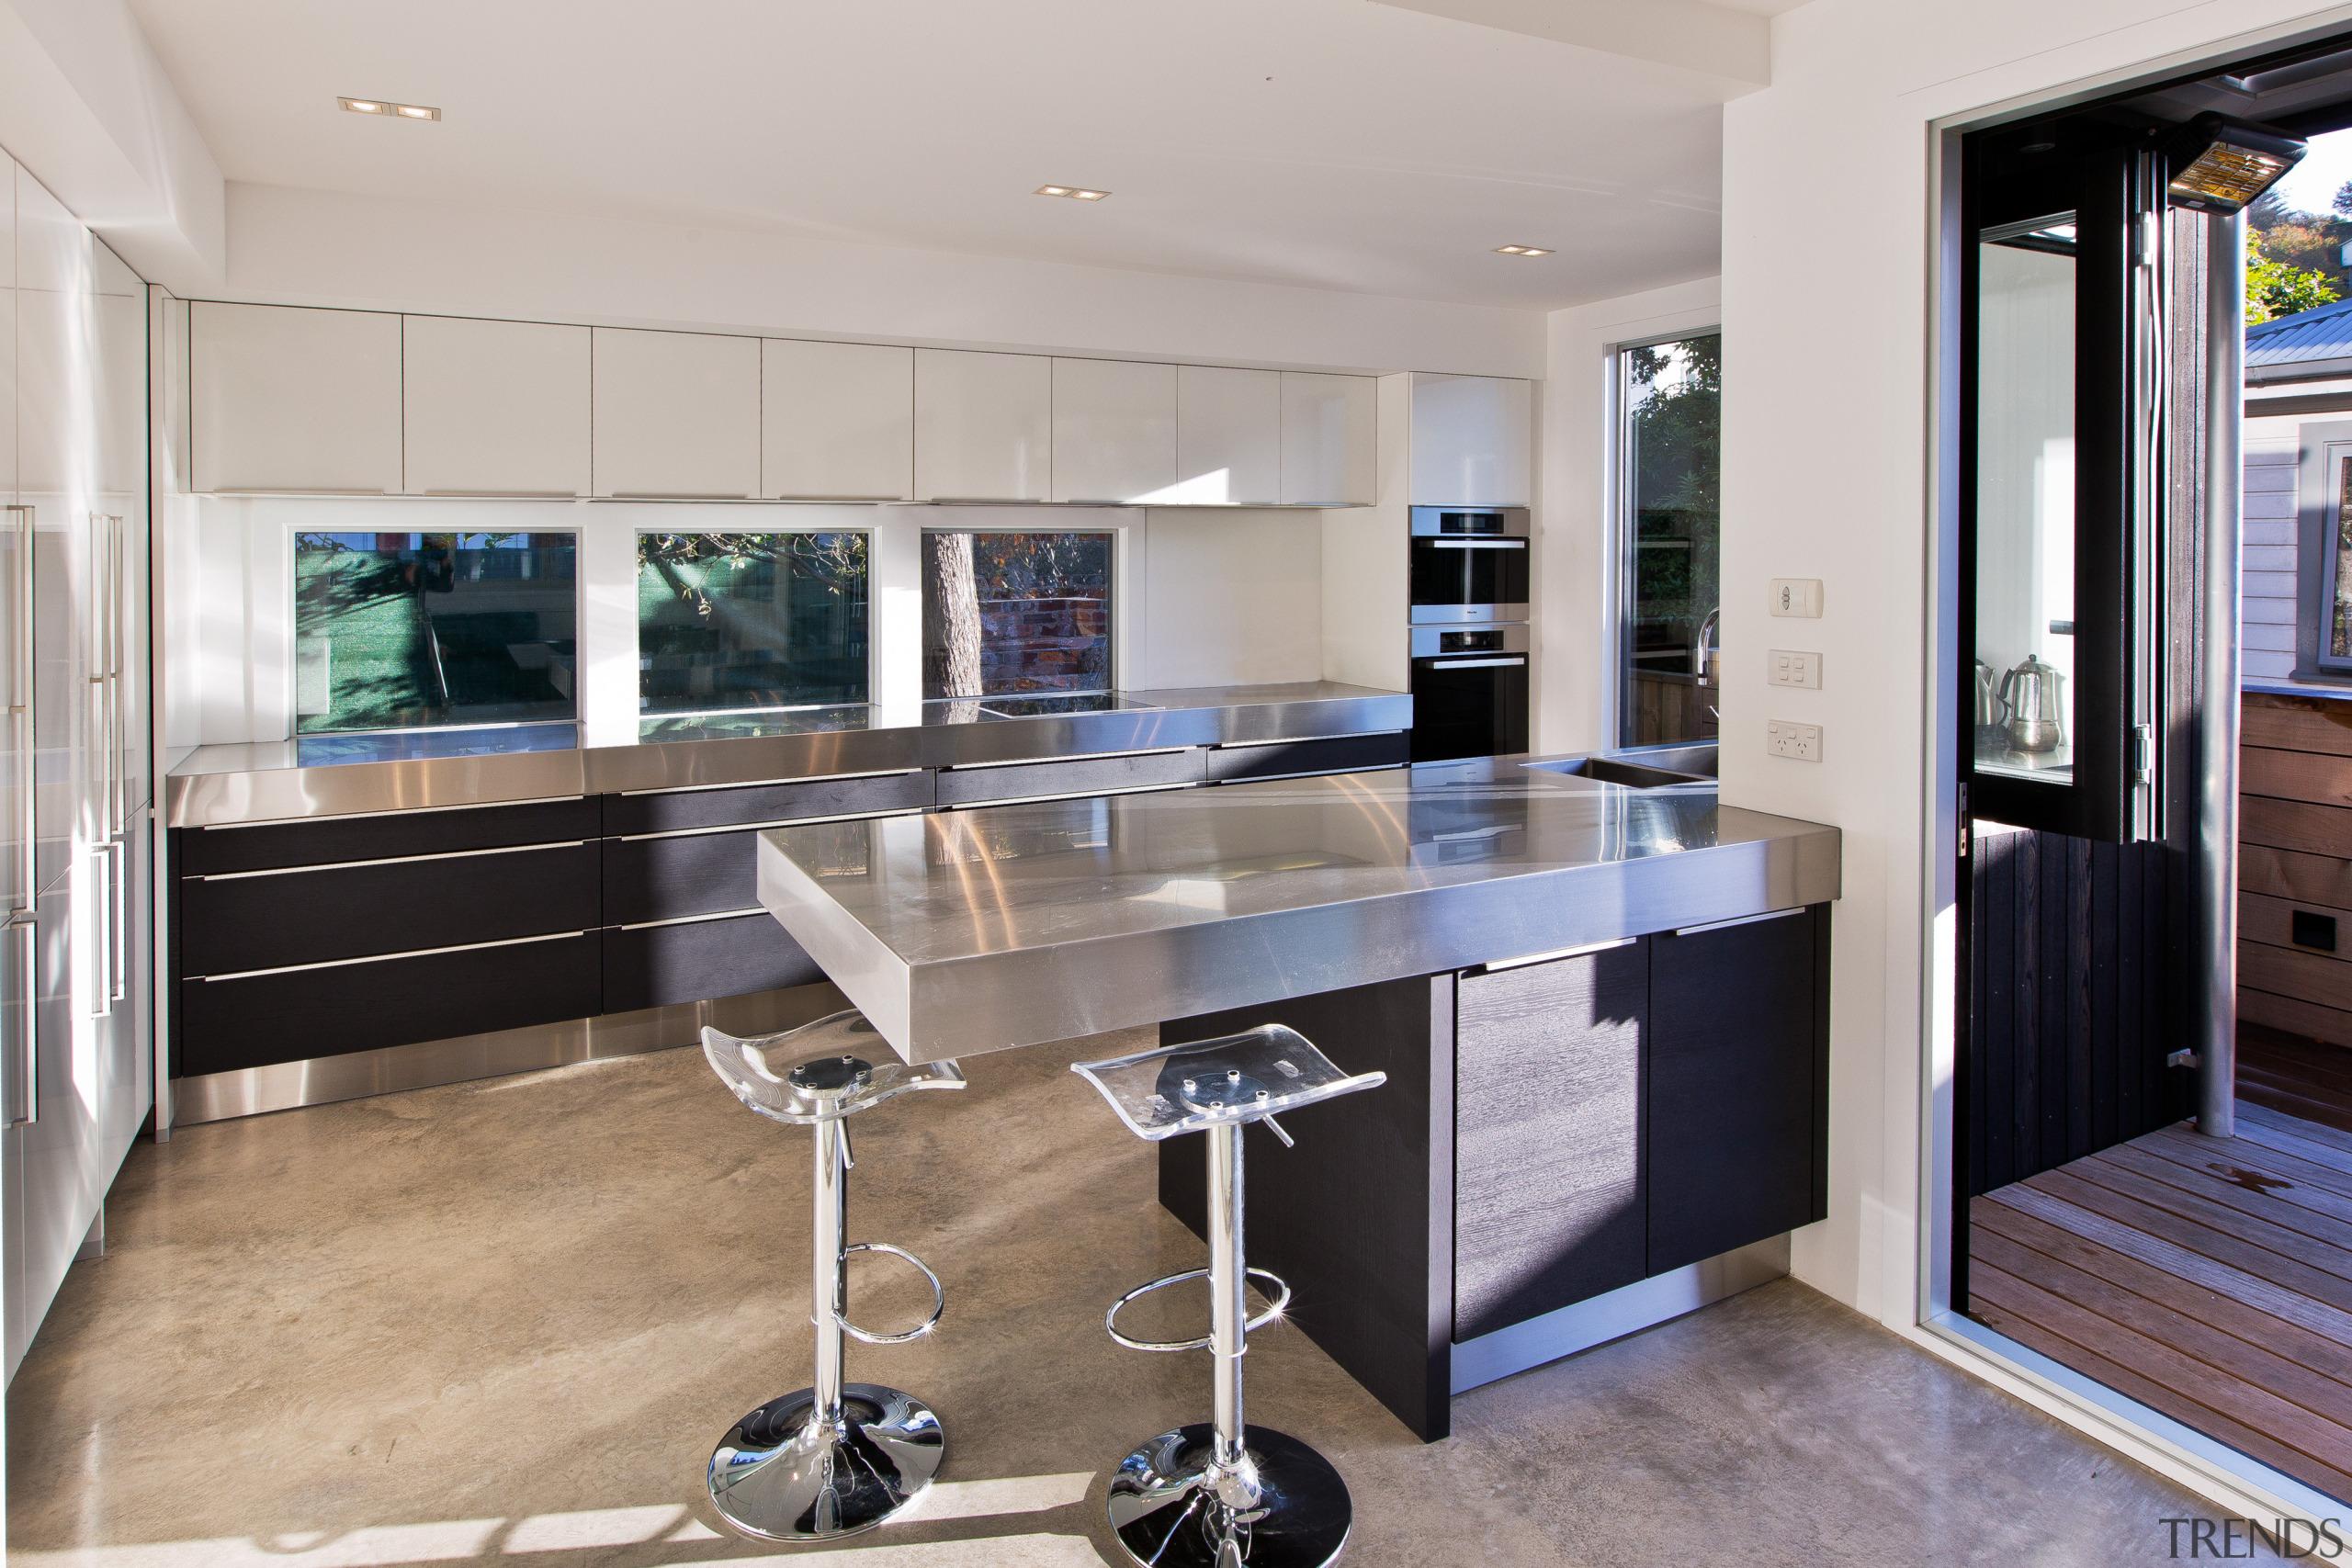 This kitchen by designer Milvia Hannah responds to countertop, floor, interior design, kitchen, real estate, gray